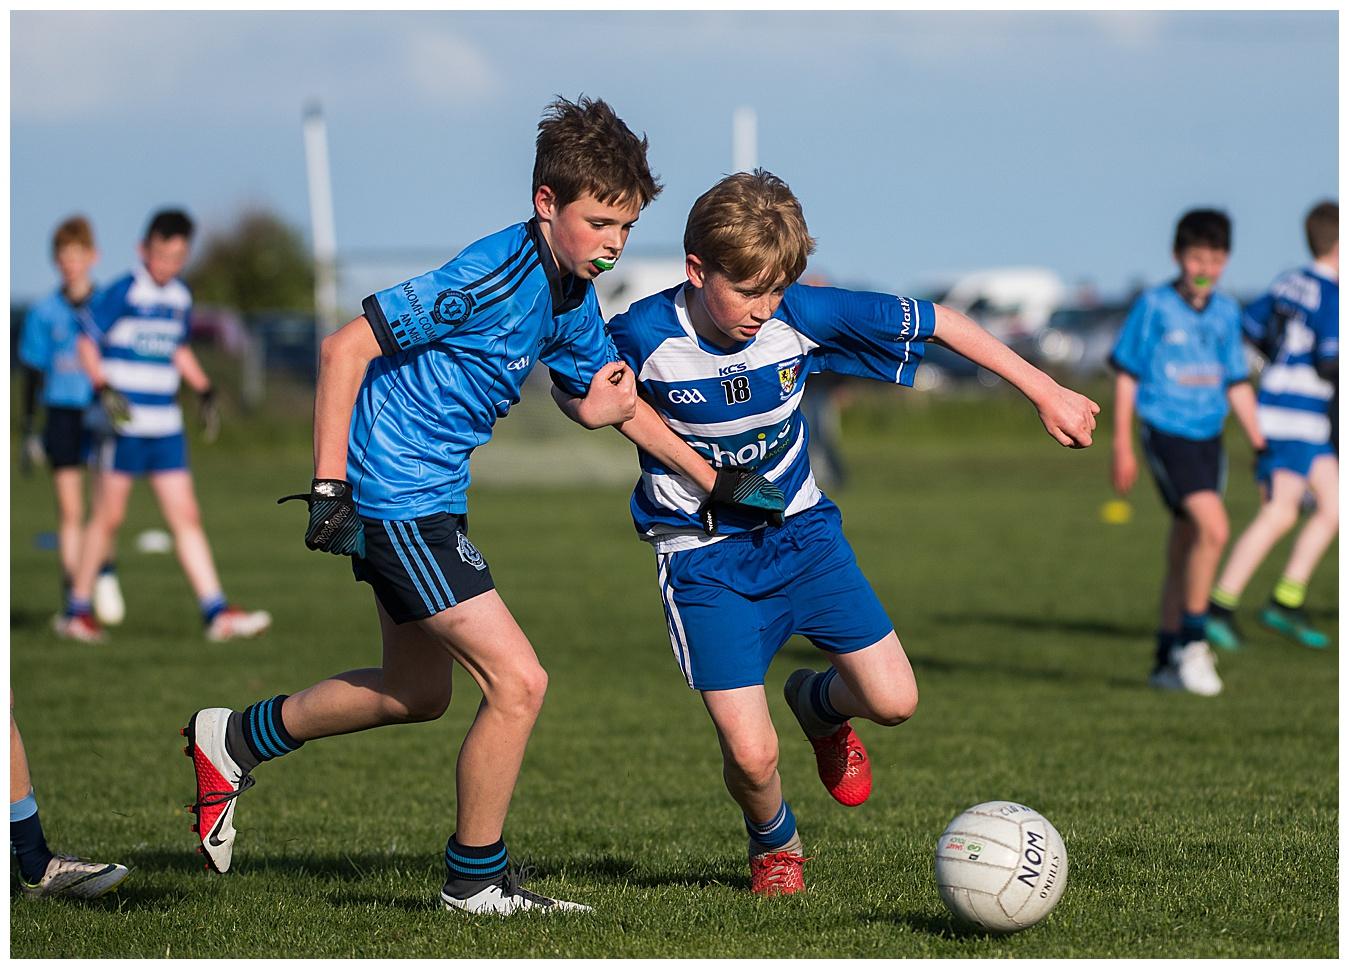 St Colmcilles U12 Boys Vs Navan O'Mahony's